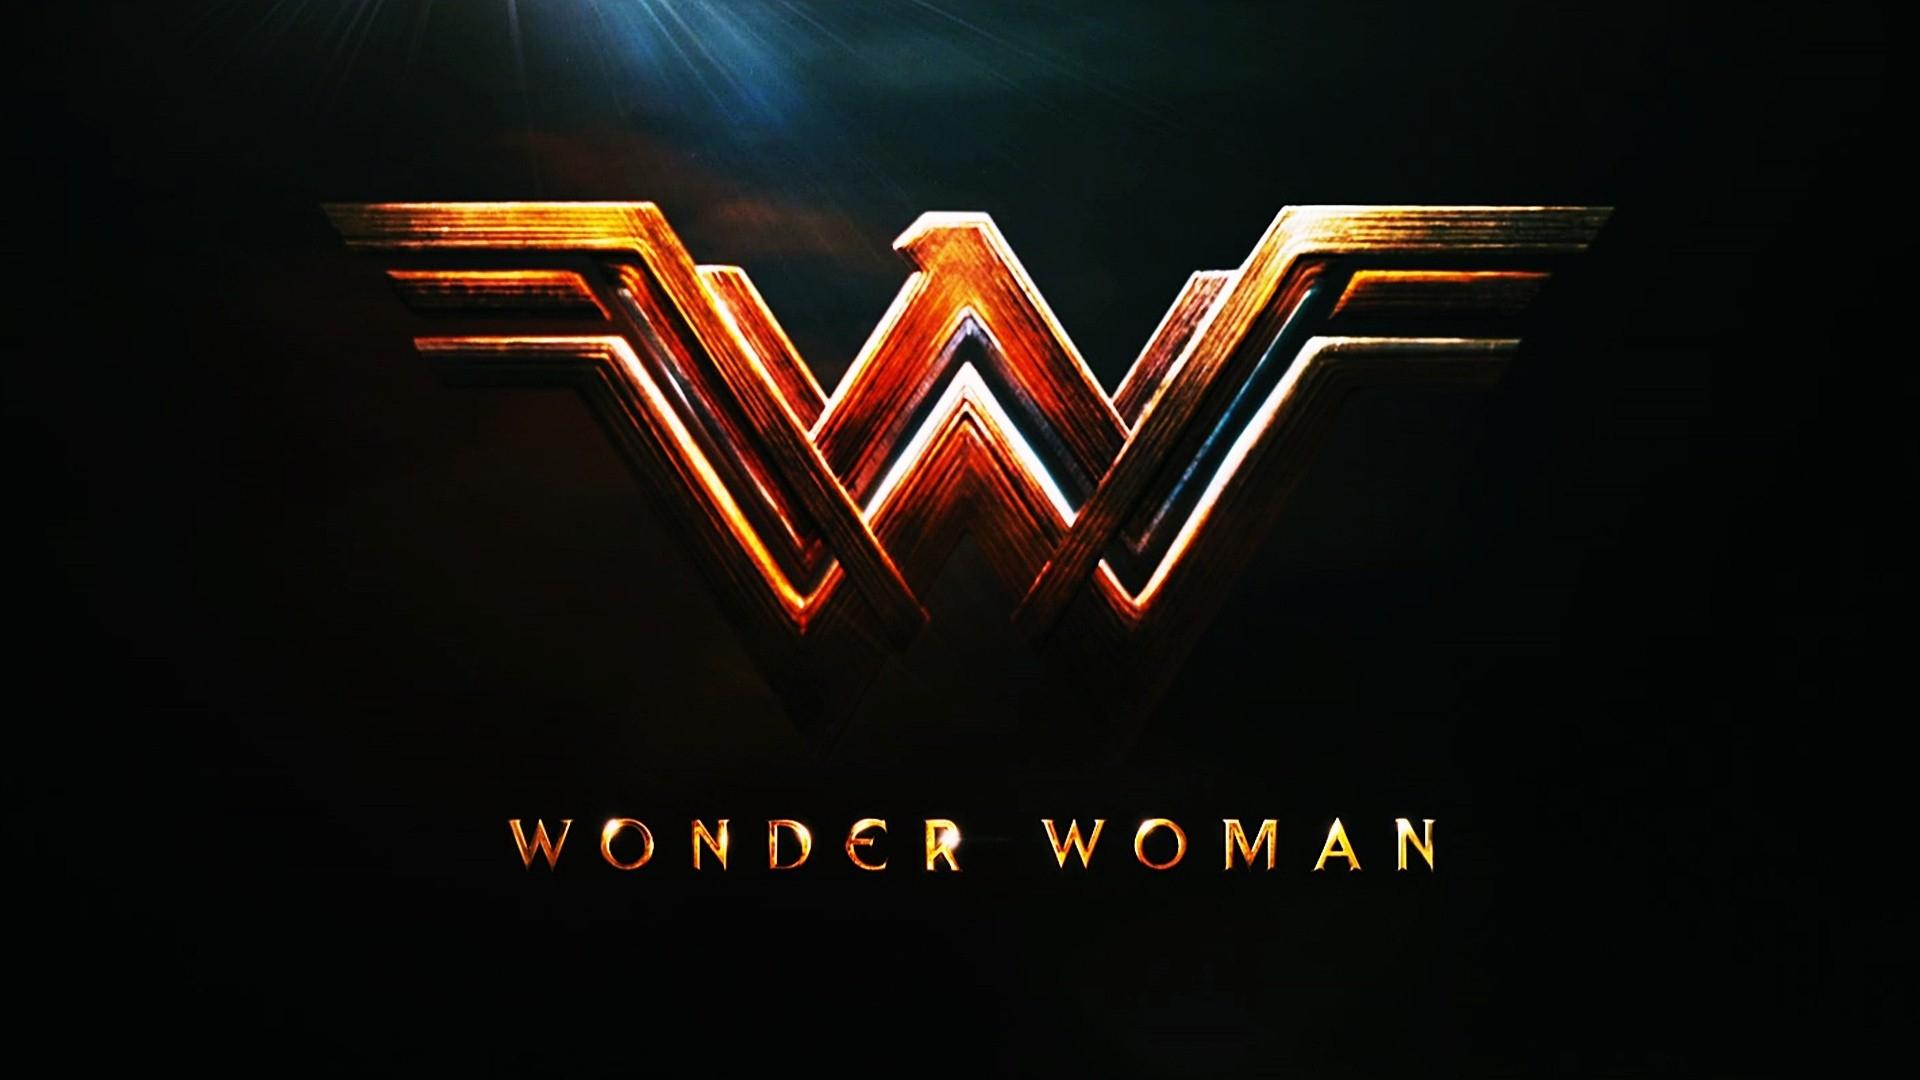 wonder woman logo wallpaper - media file | pixelstalk